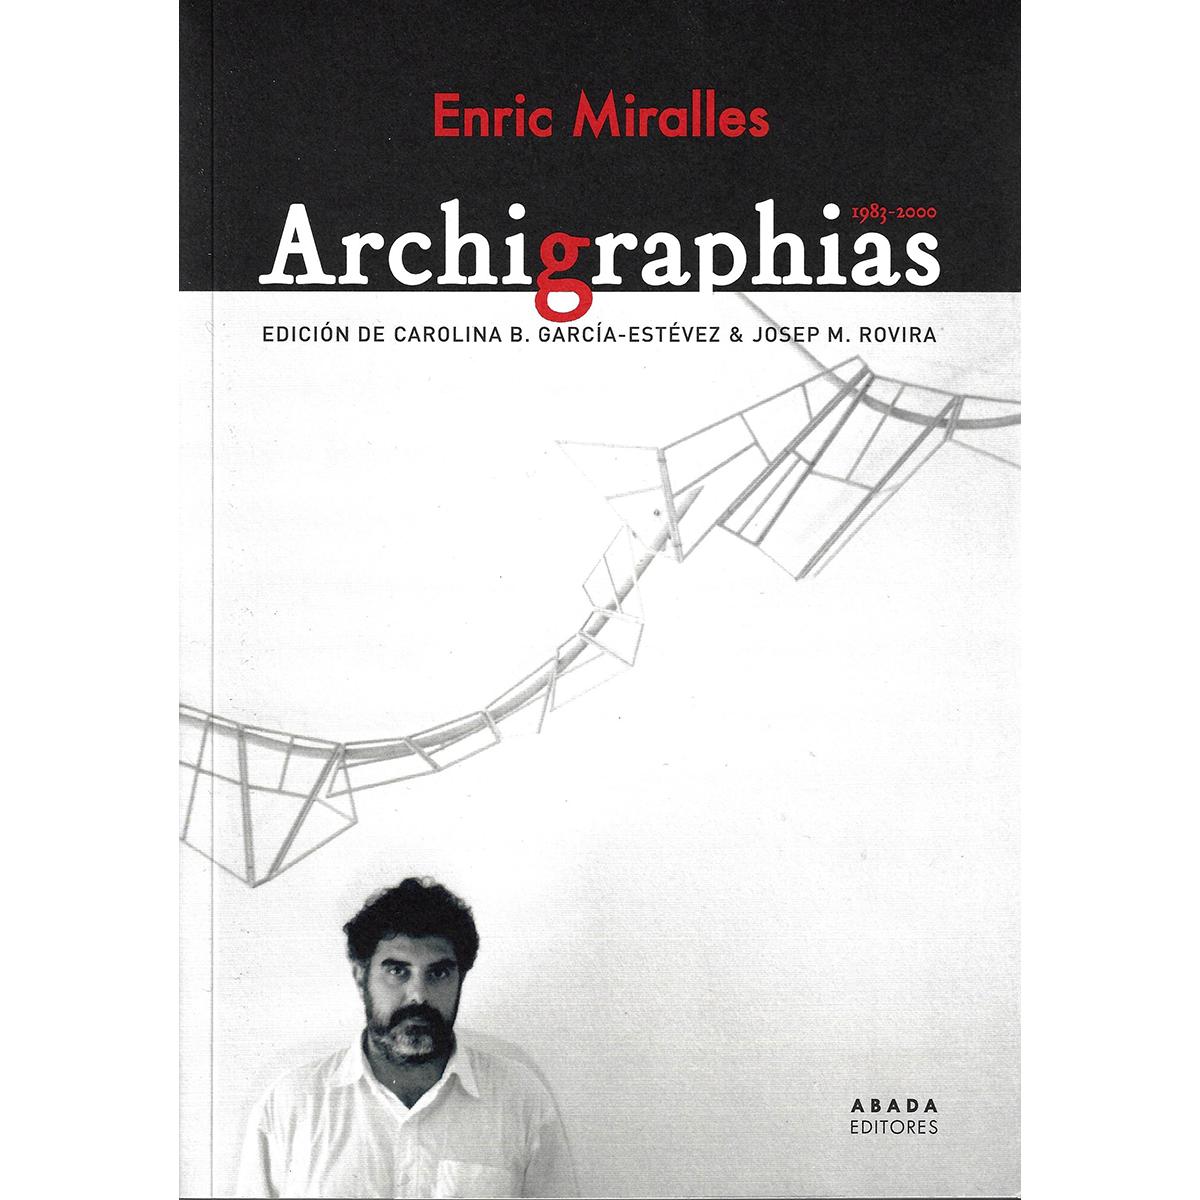 Enric Miralles: Archigraphias